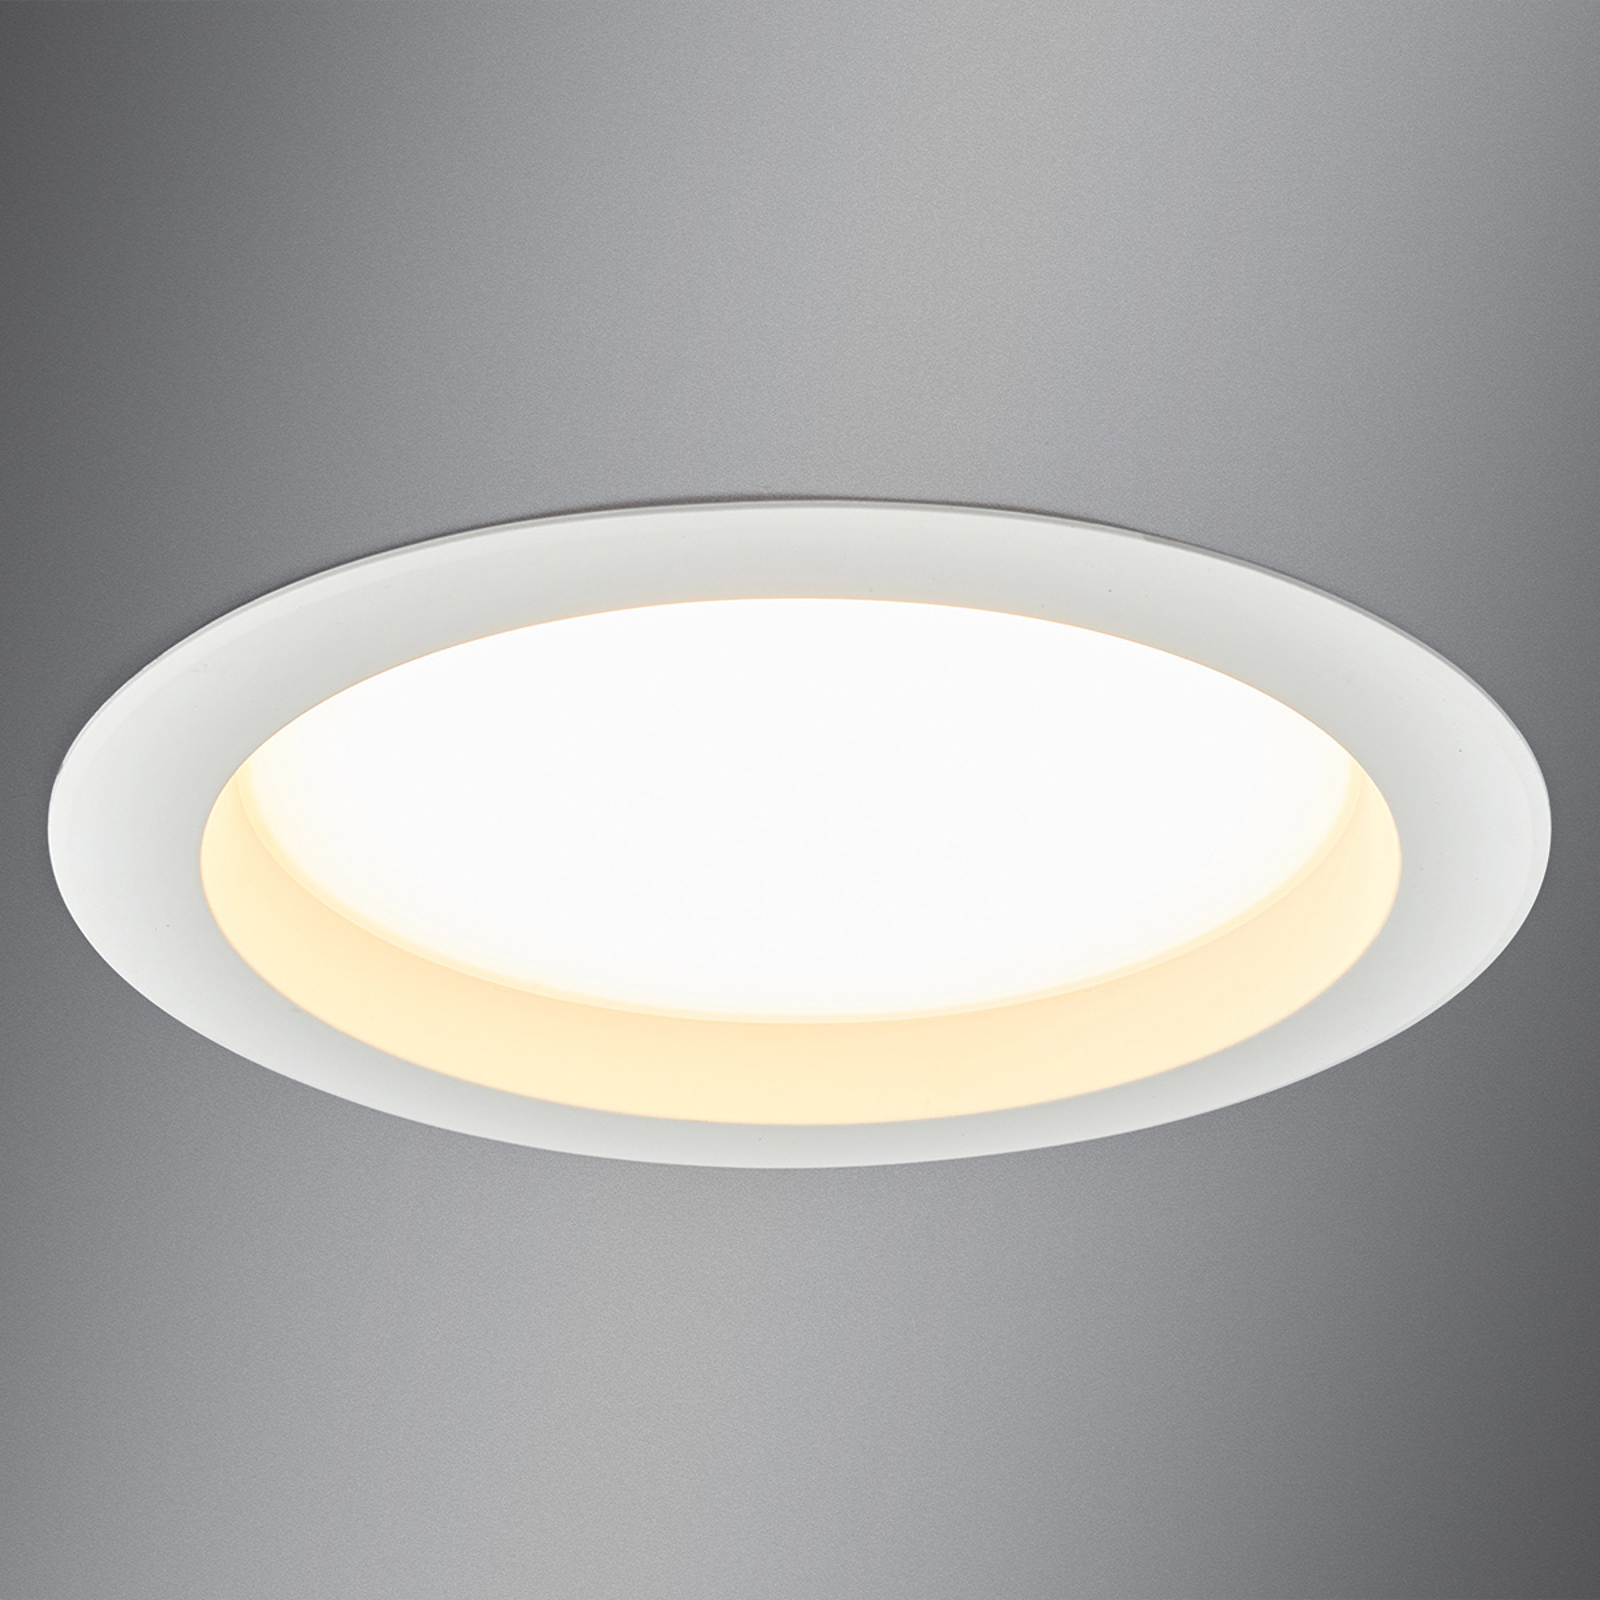 Stor LED-indbygningsspot Arian, 24,4 cm 22,5W